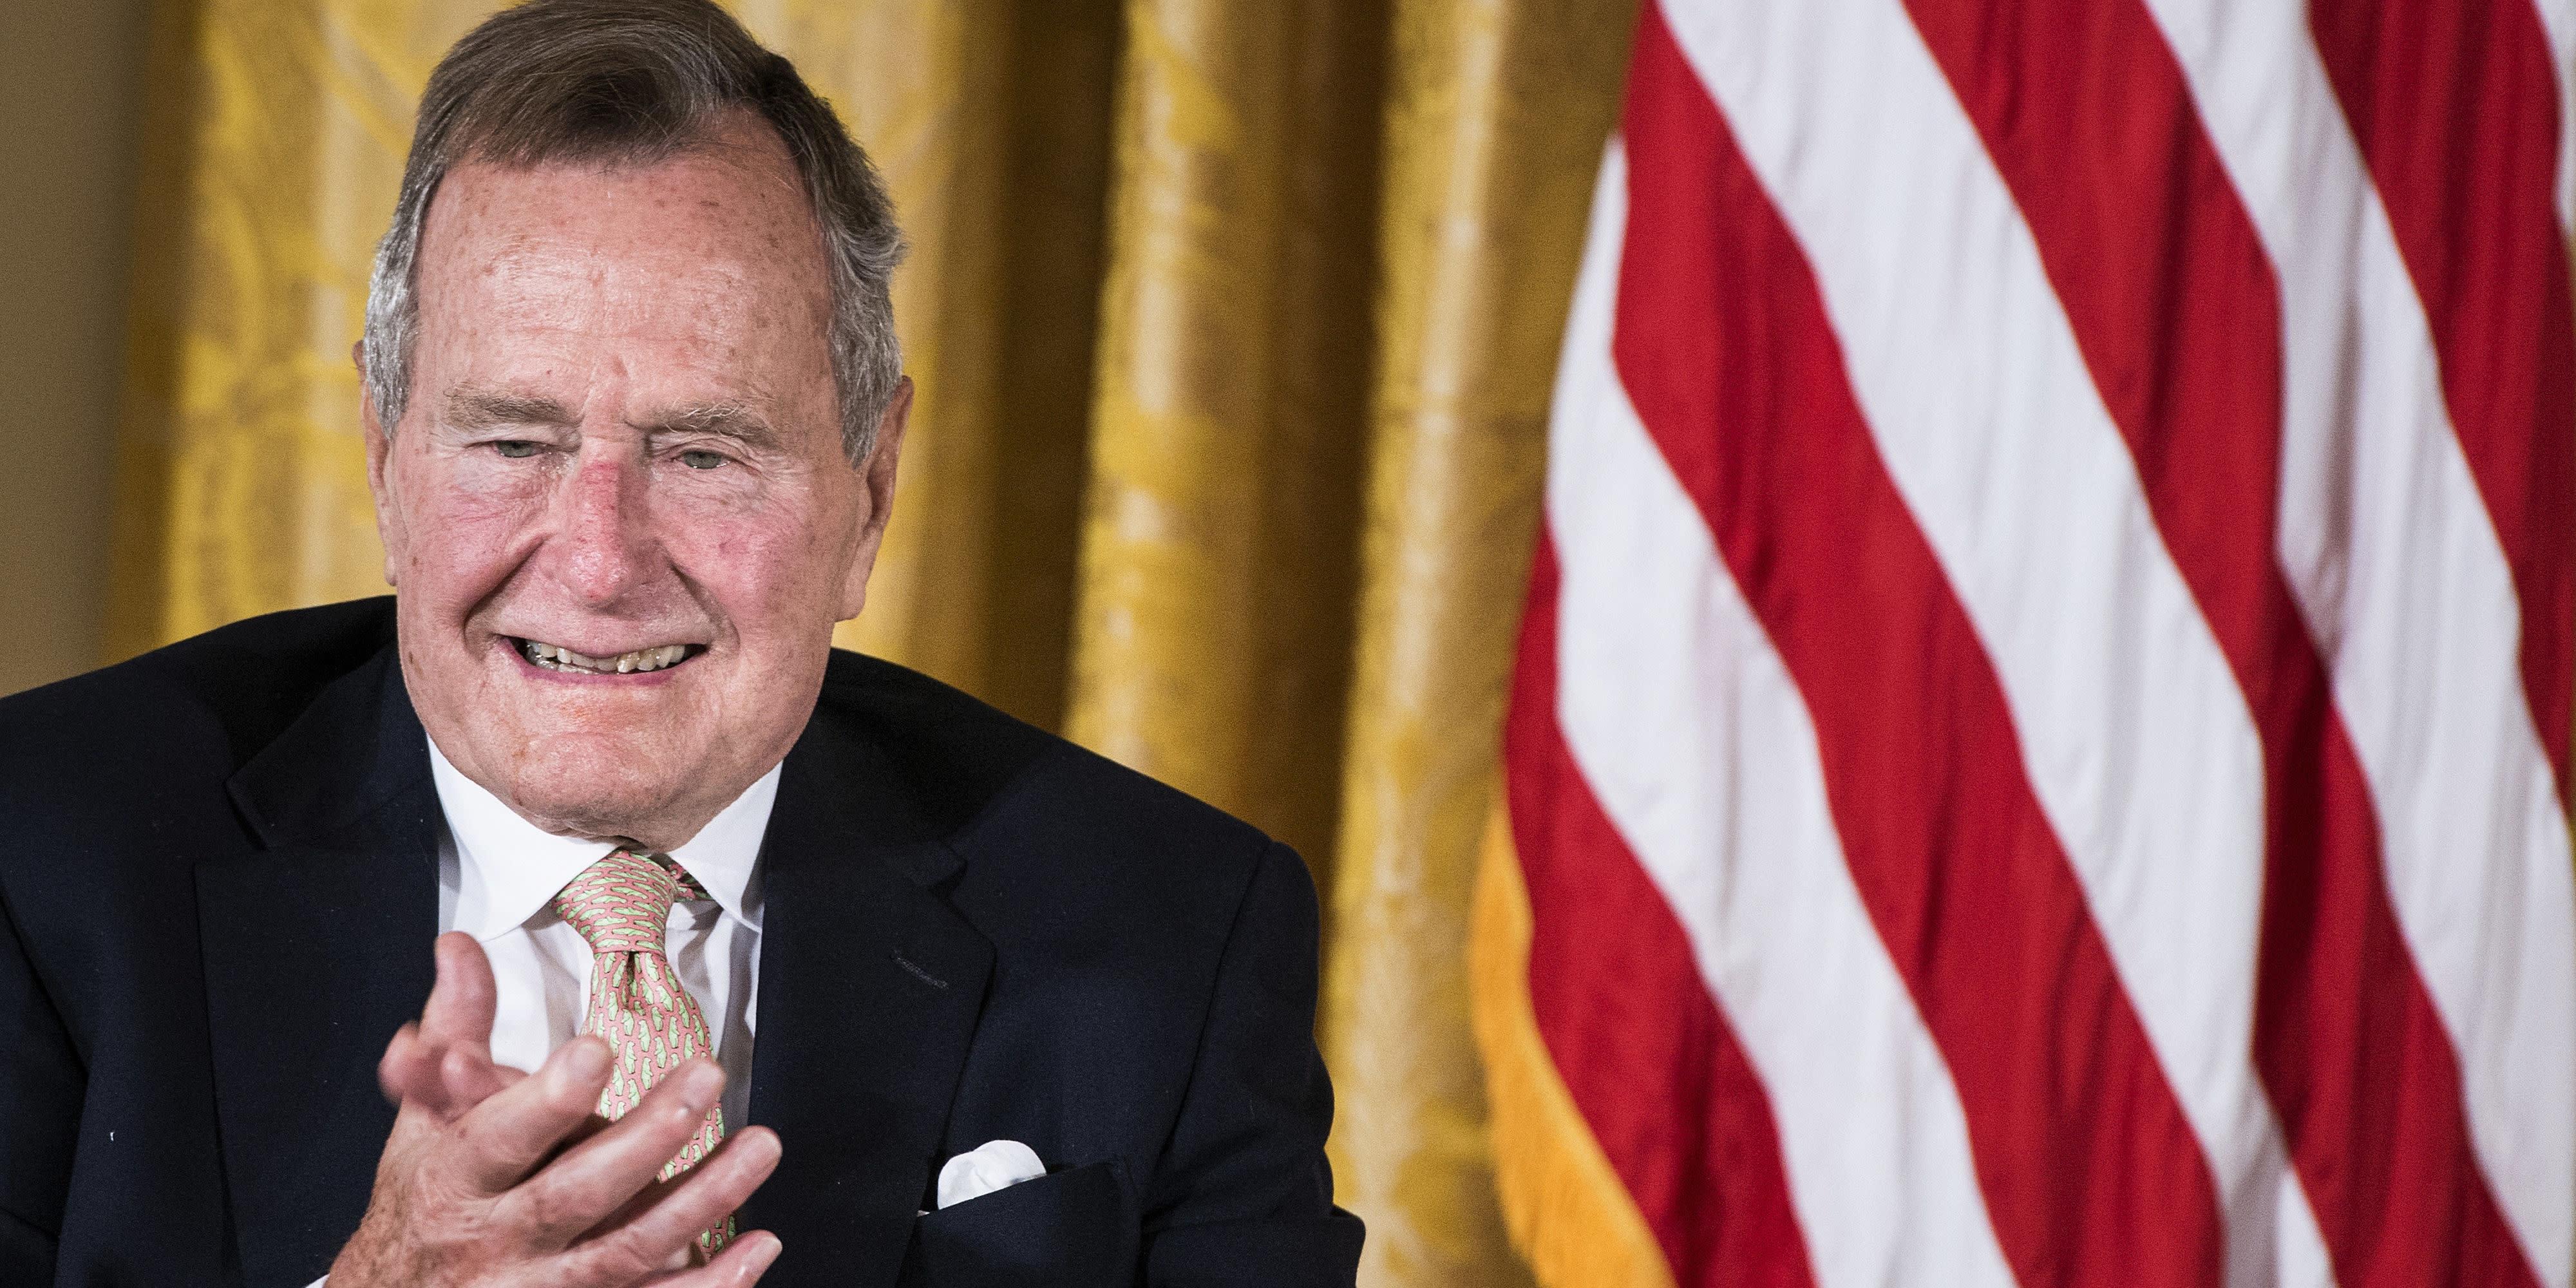 a biography of george w bush before becoming the president of america George hw bush: george hw bush, vice president of the united states (1981–89), 41st us president (1989–93), and father of the 43rd us president, george w bush.